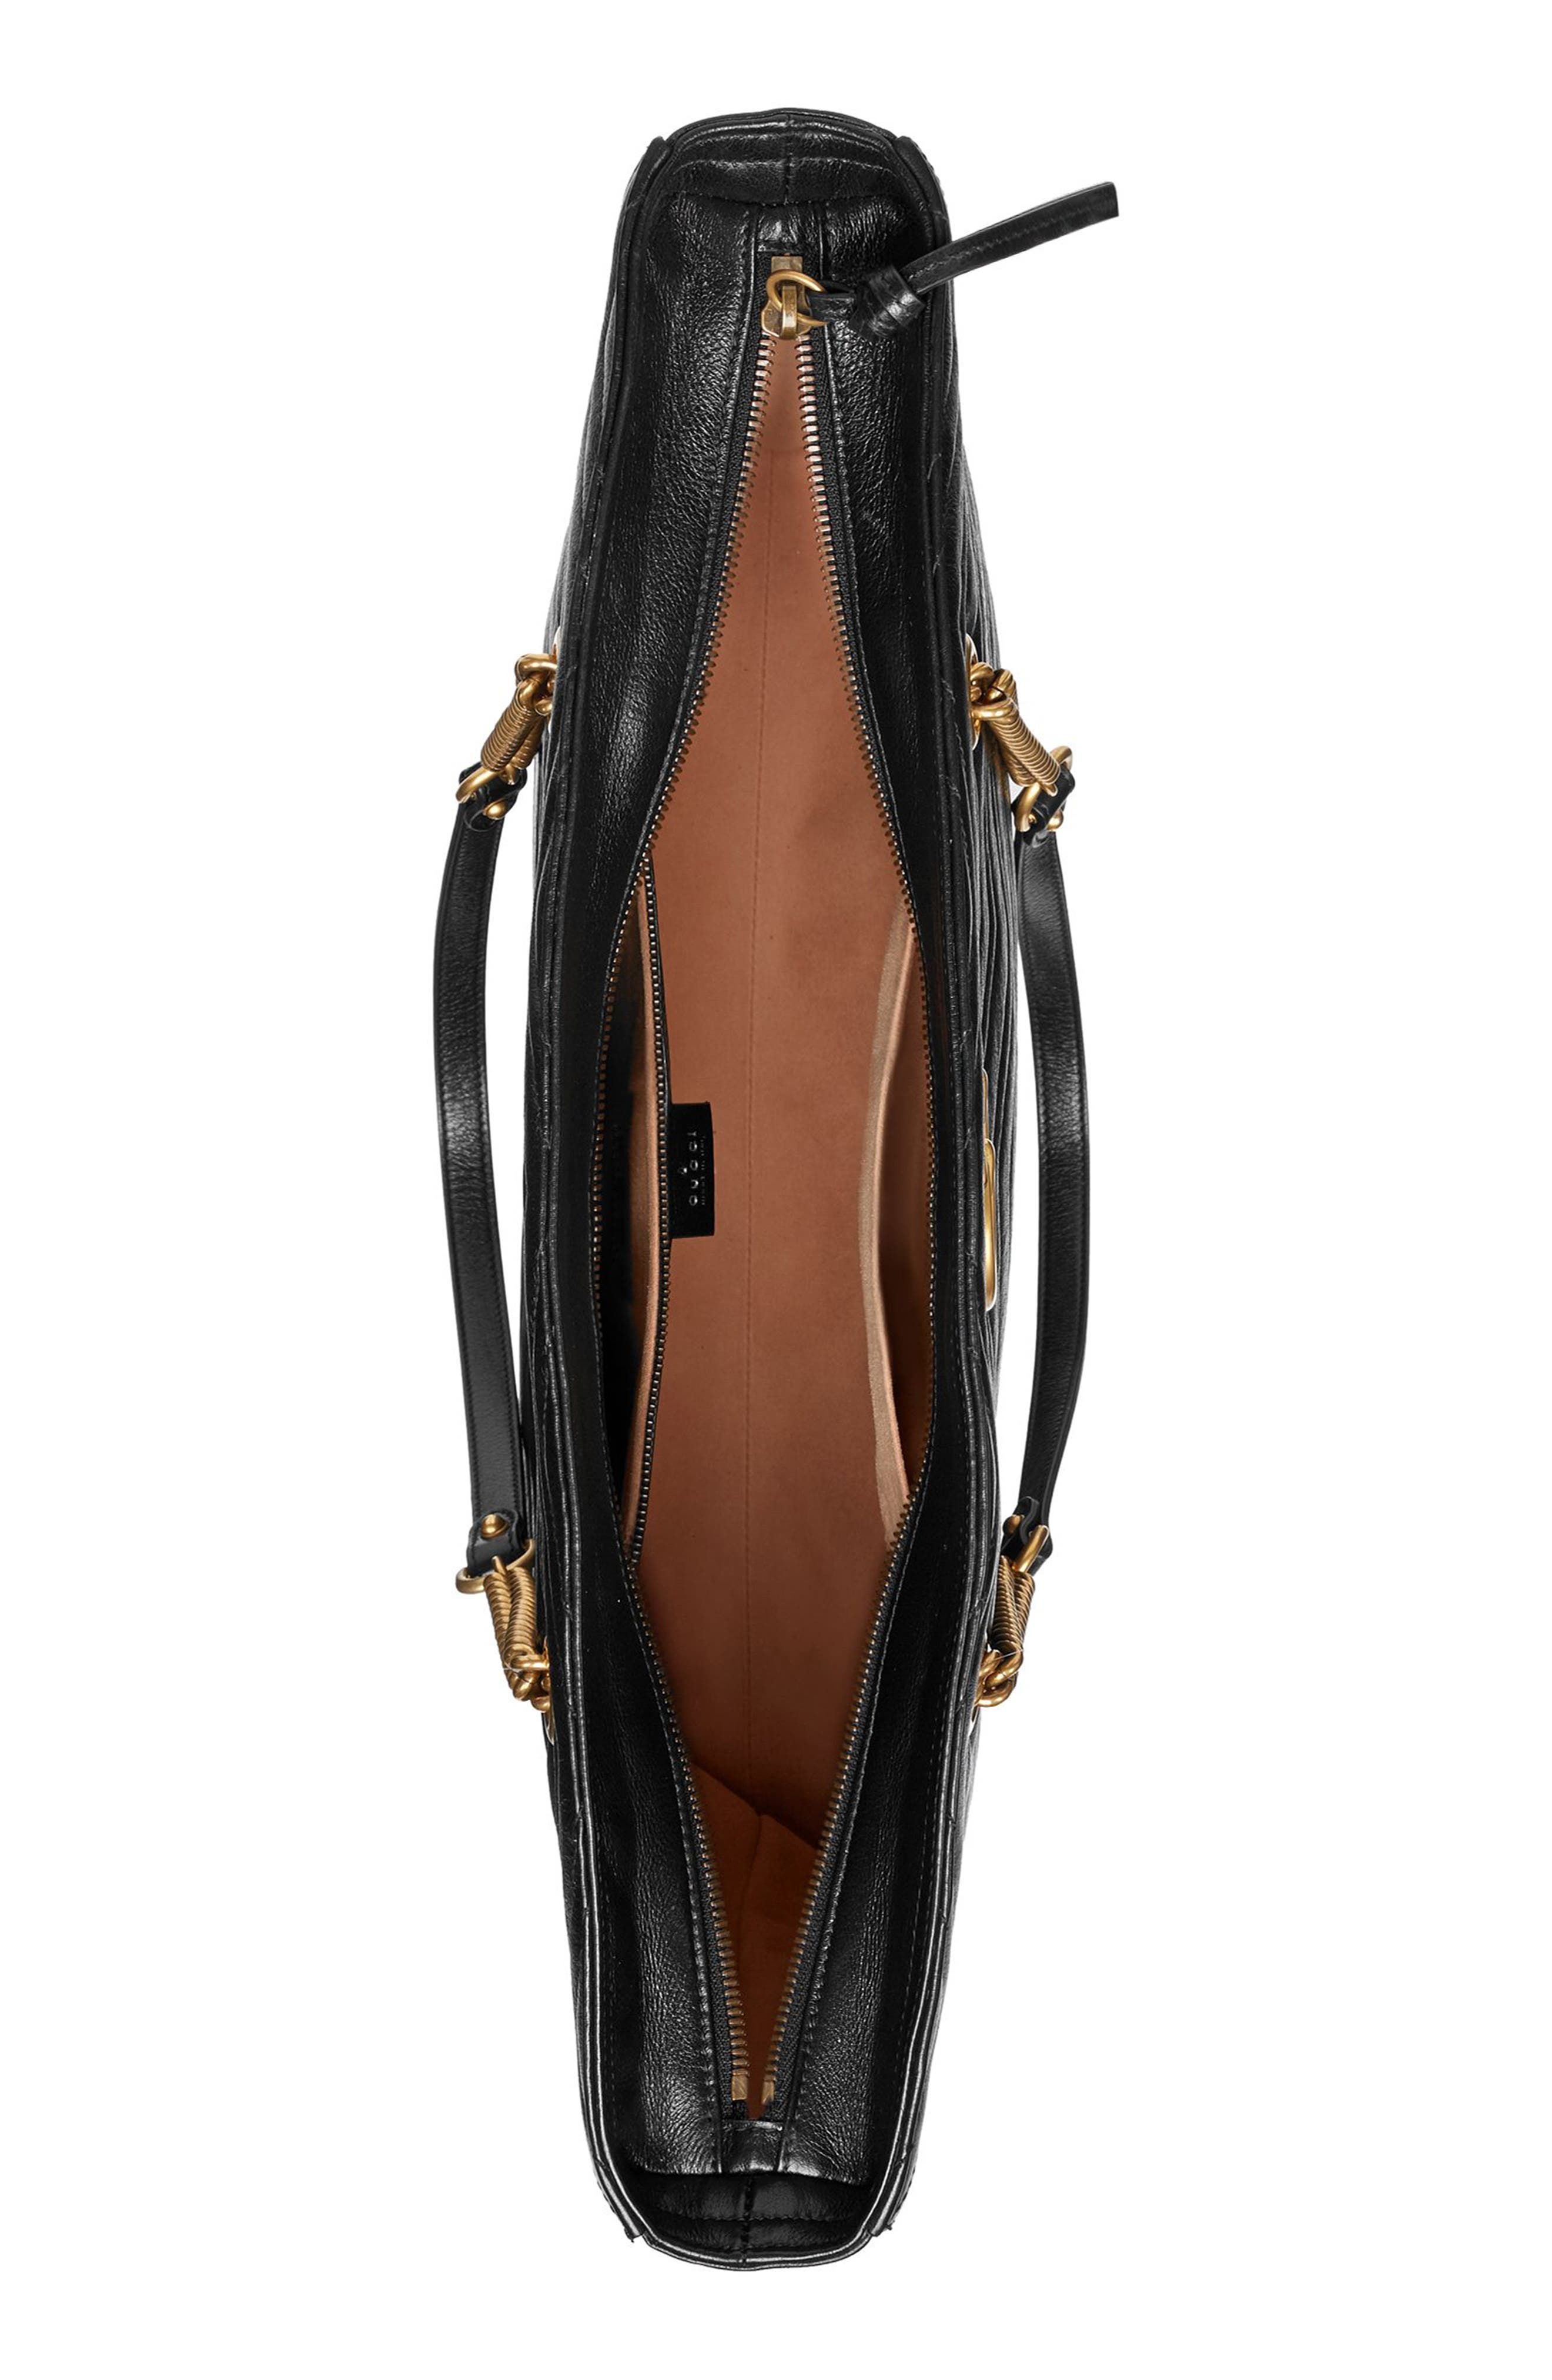 GG Marmont 2.0 Matelassé Leather North/South Tote Bag,                             Alternate thumbnail 3, color,                             NERO/ NERO